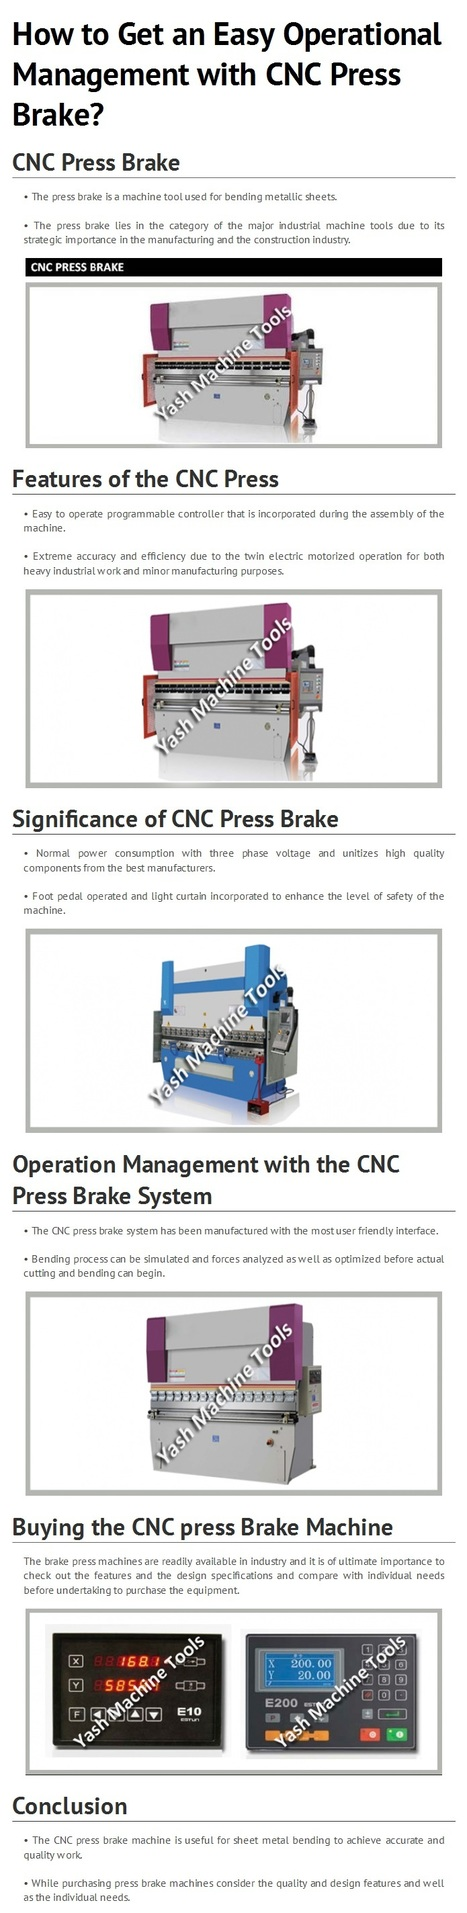 Explore Operation Management of CNC Press Brake by www.yashmachine.com   Lathe Machines   Scoop.it